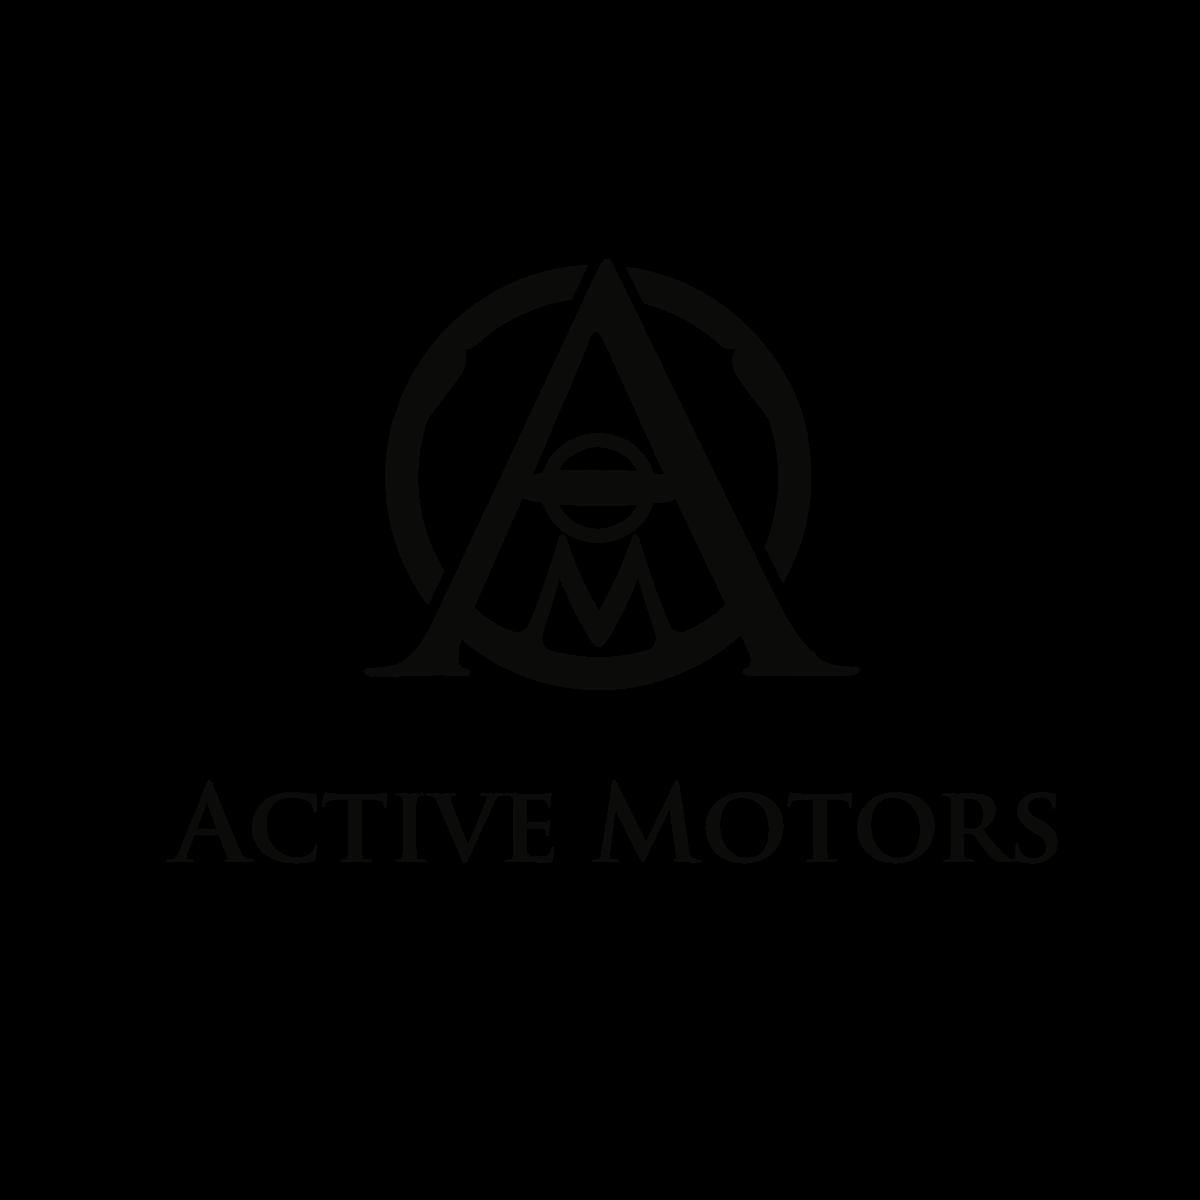 active motors